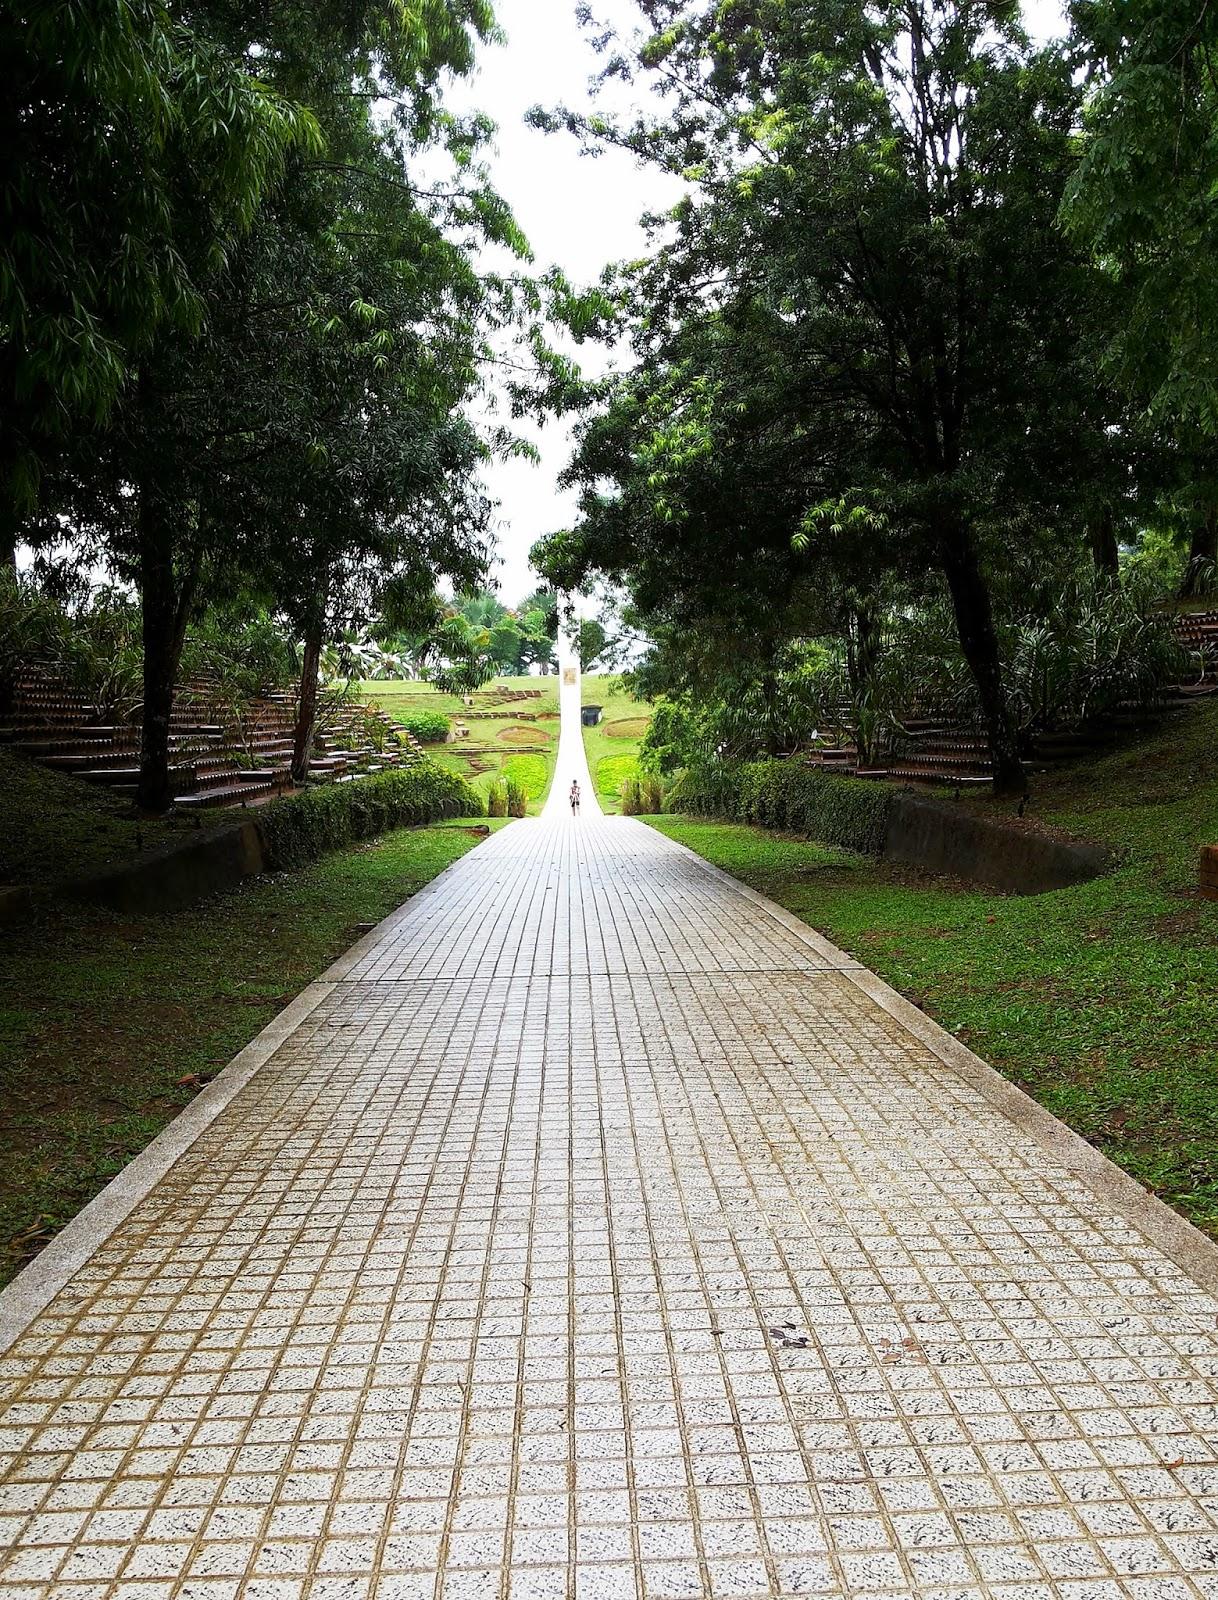 Taman Botani Tempat Menarik di Putrajaya